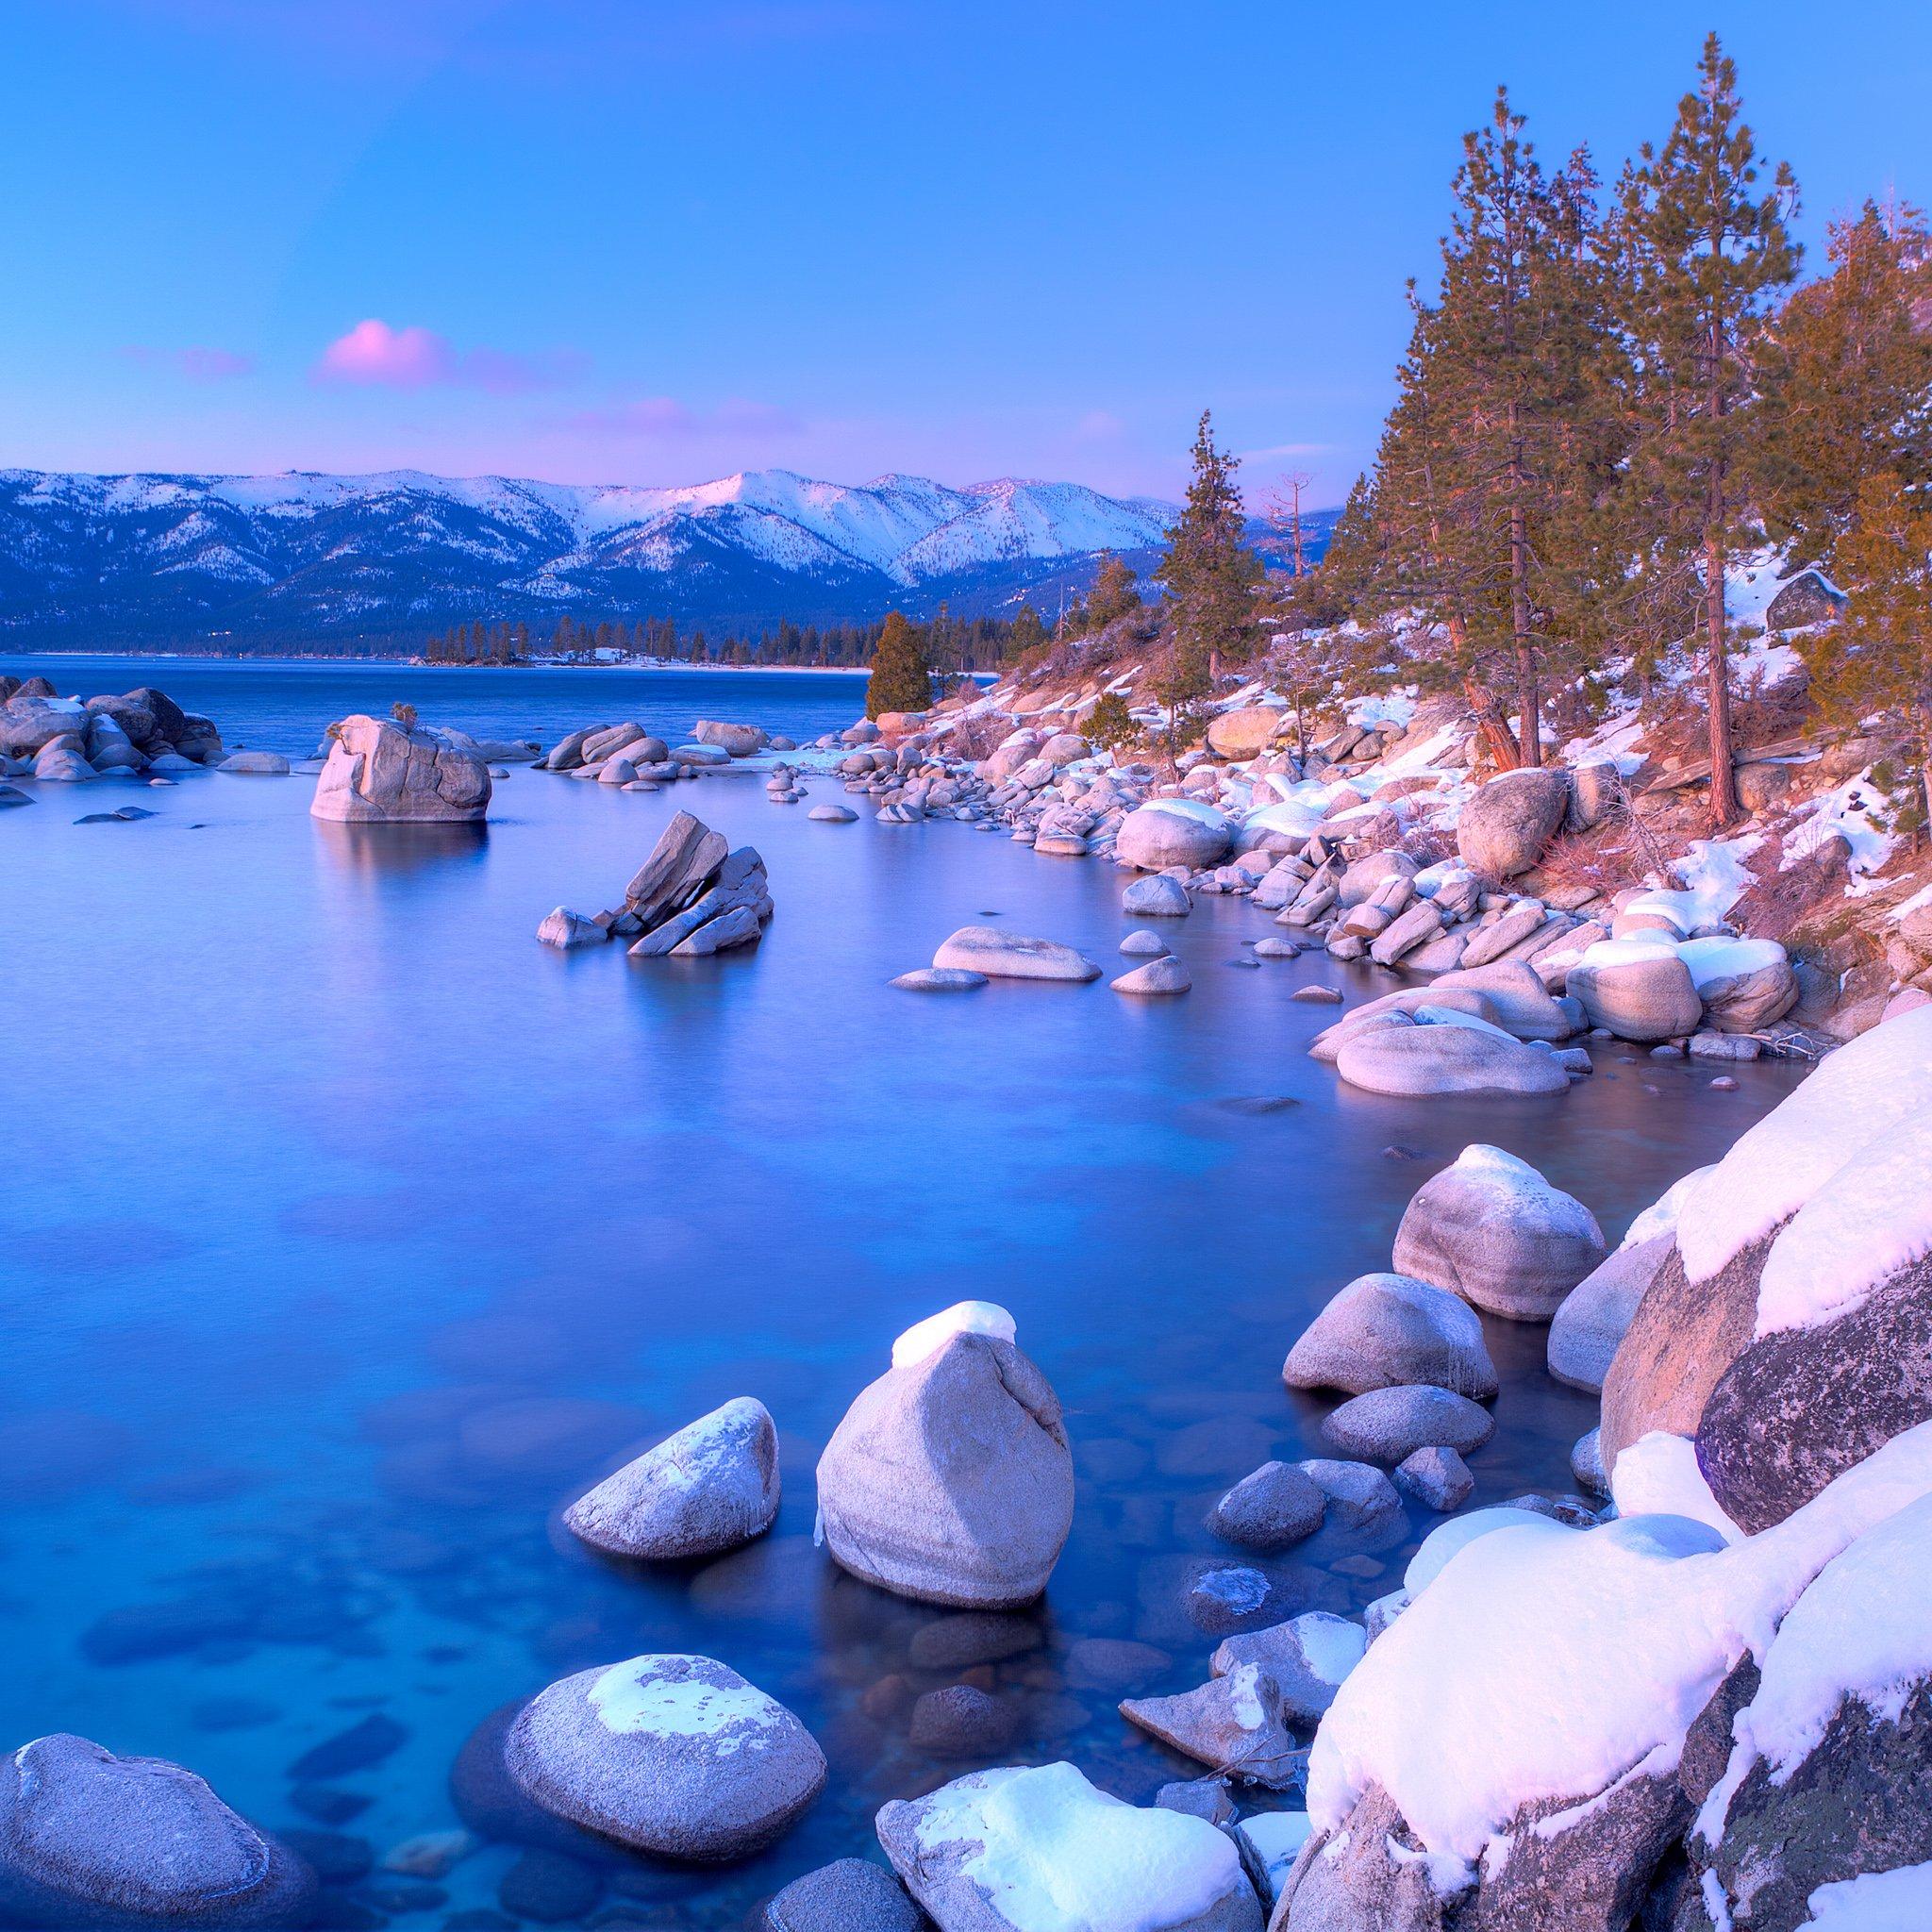 Lake Tahoe Resorts Christmas 2021 5 Best Things To Do In Lake Tahoe In The Winter Travelawaits